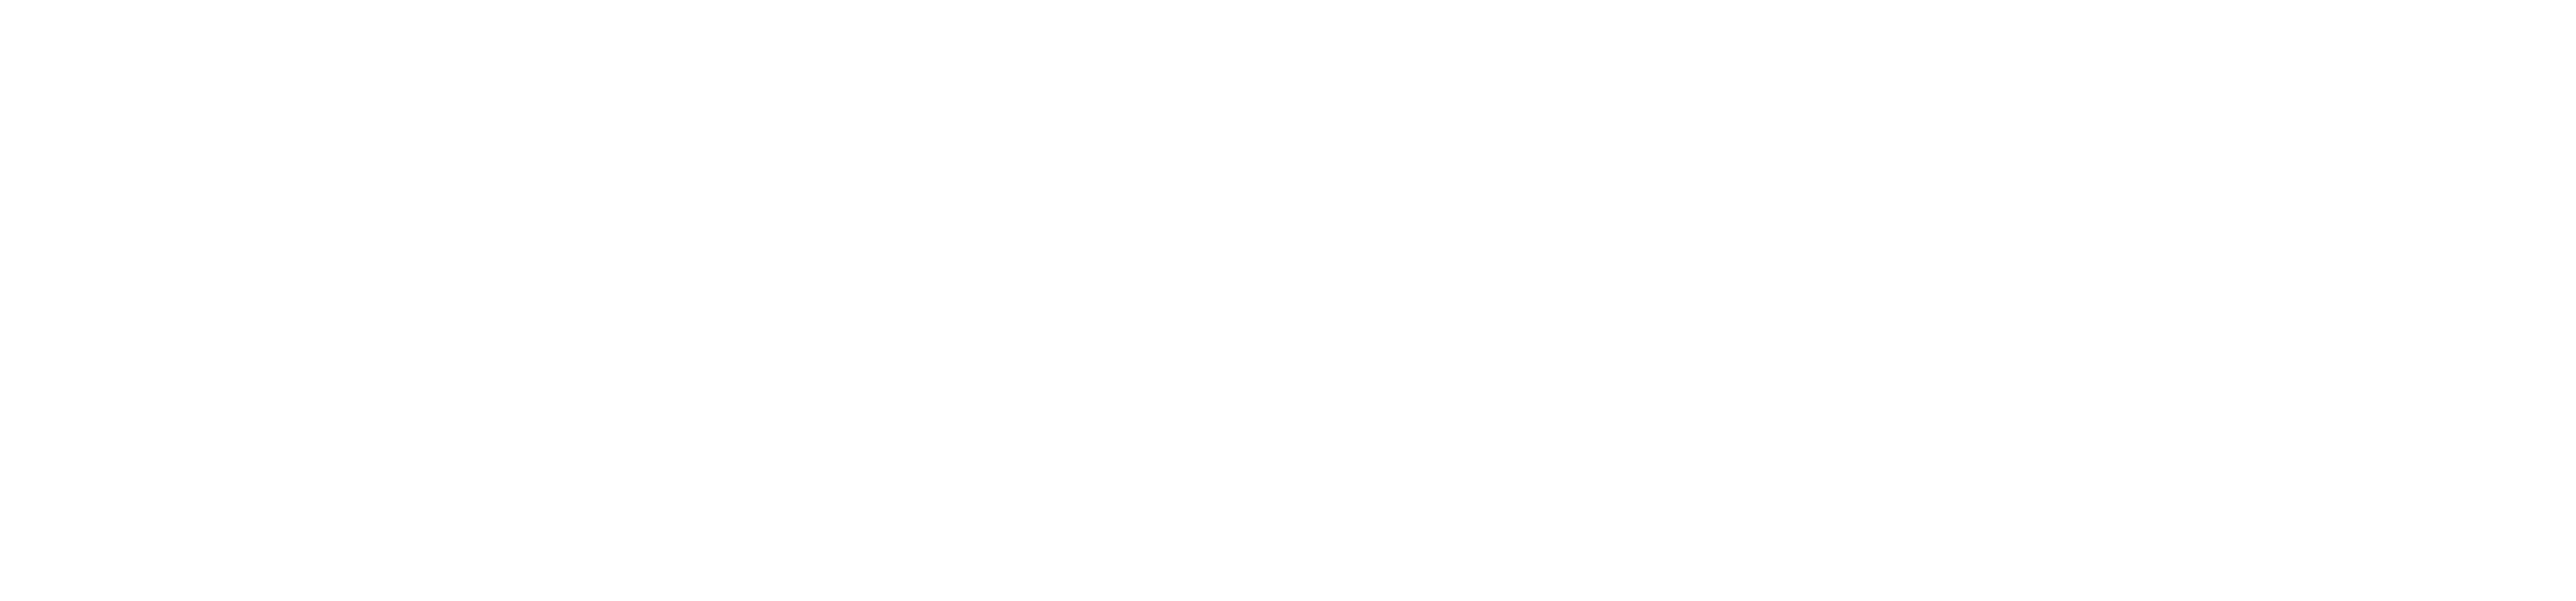 International Federation of Medical Students' Associations